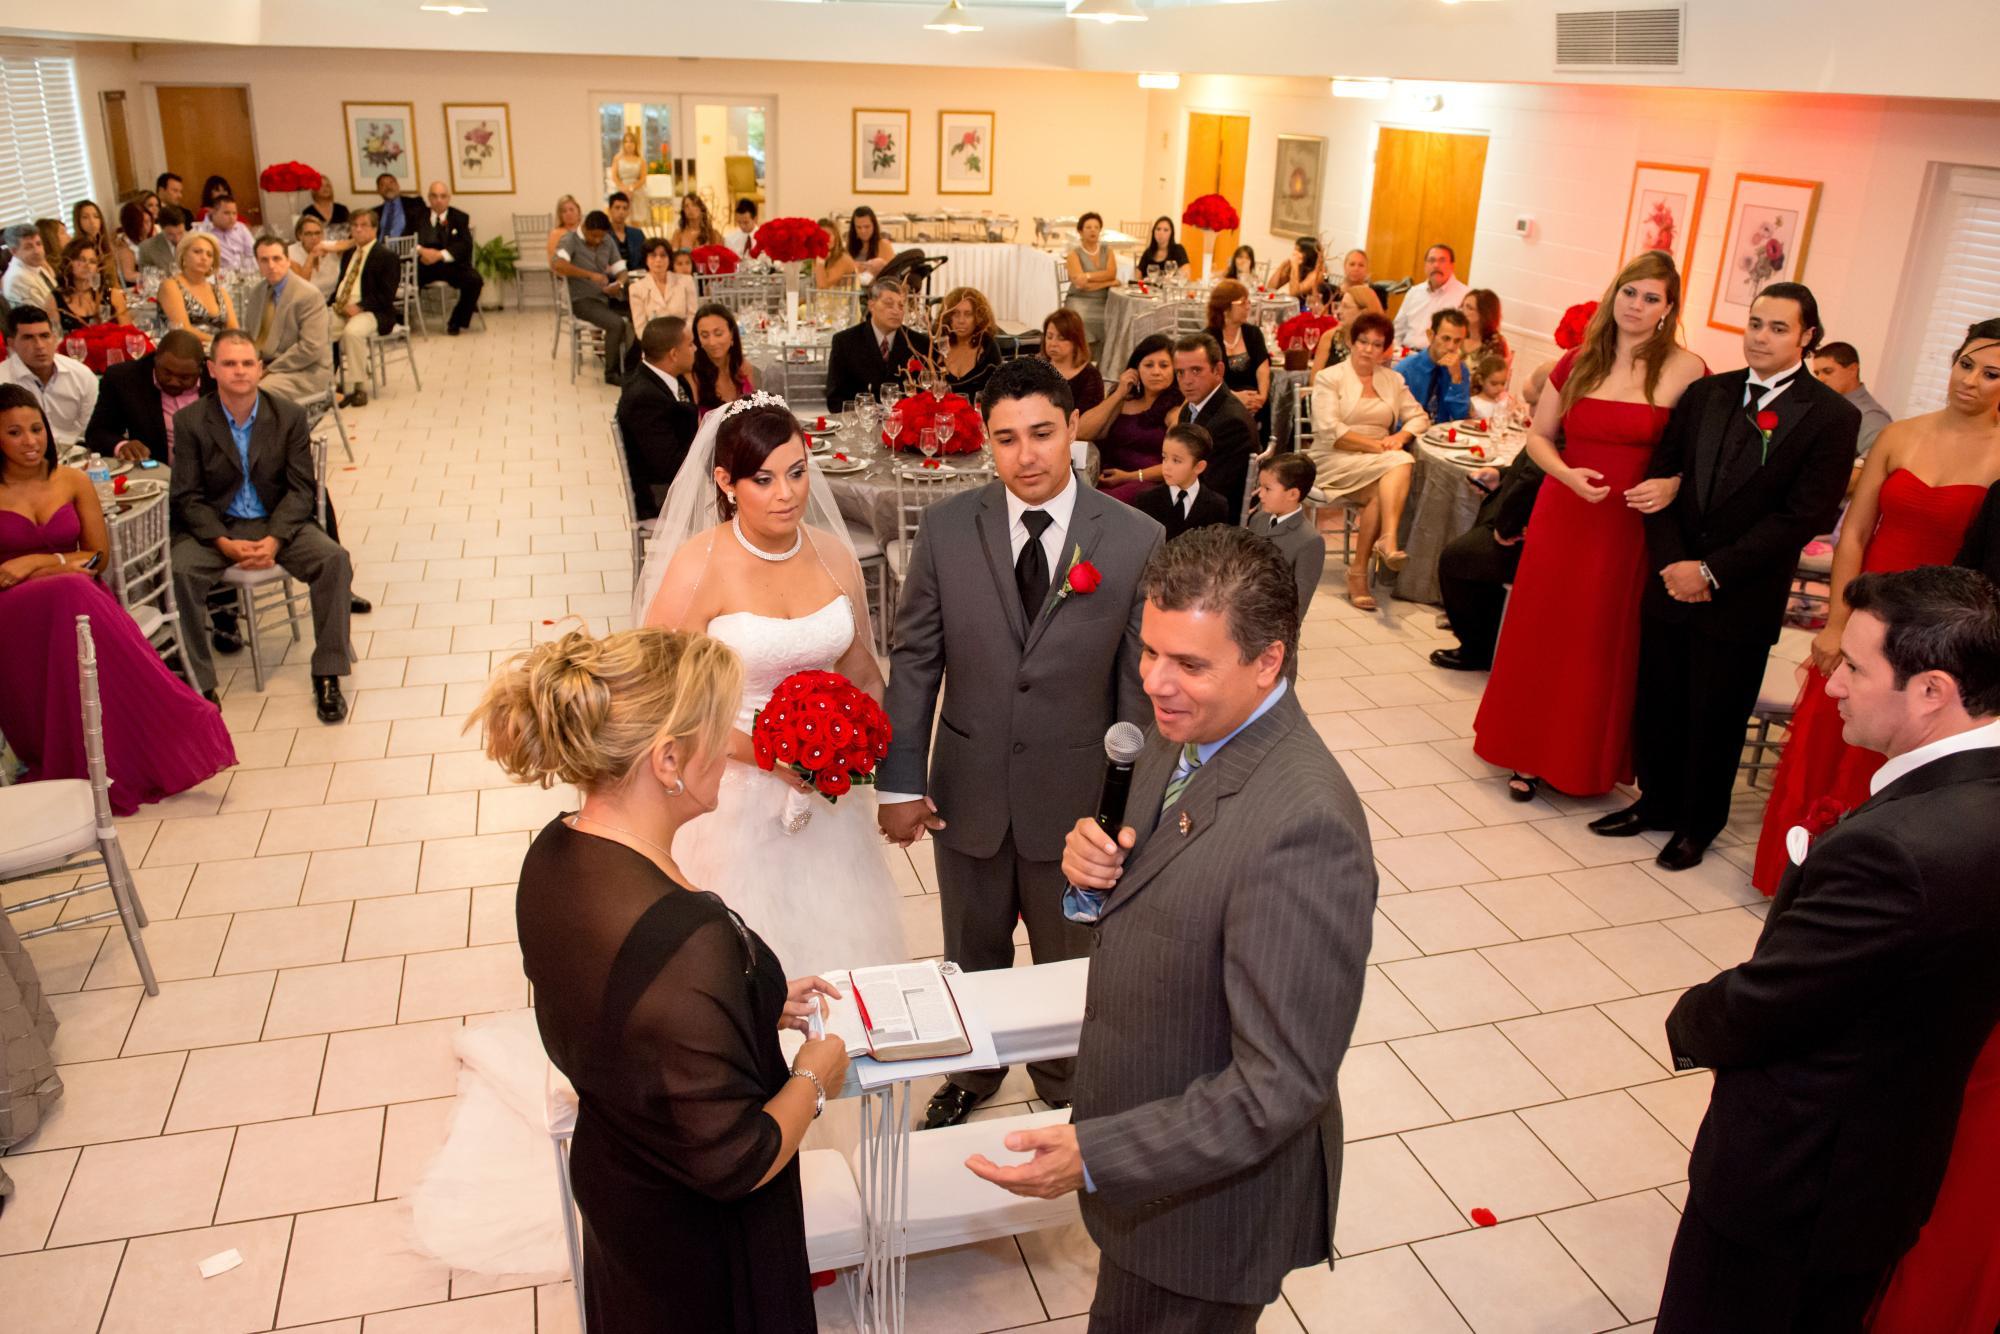 Casamentos-119.jpg